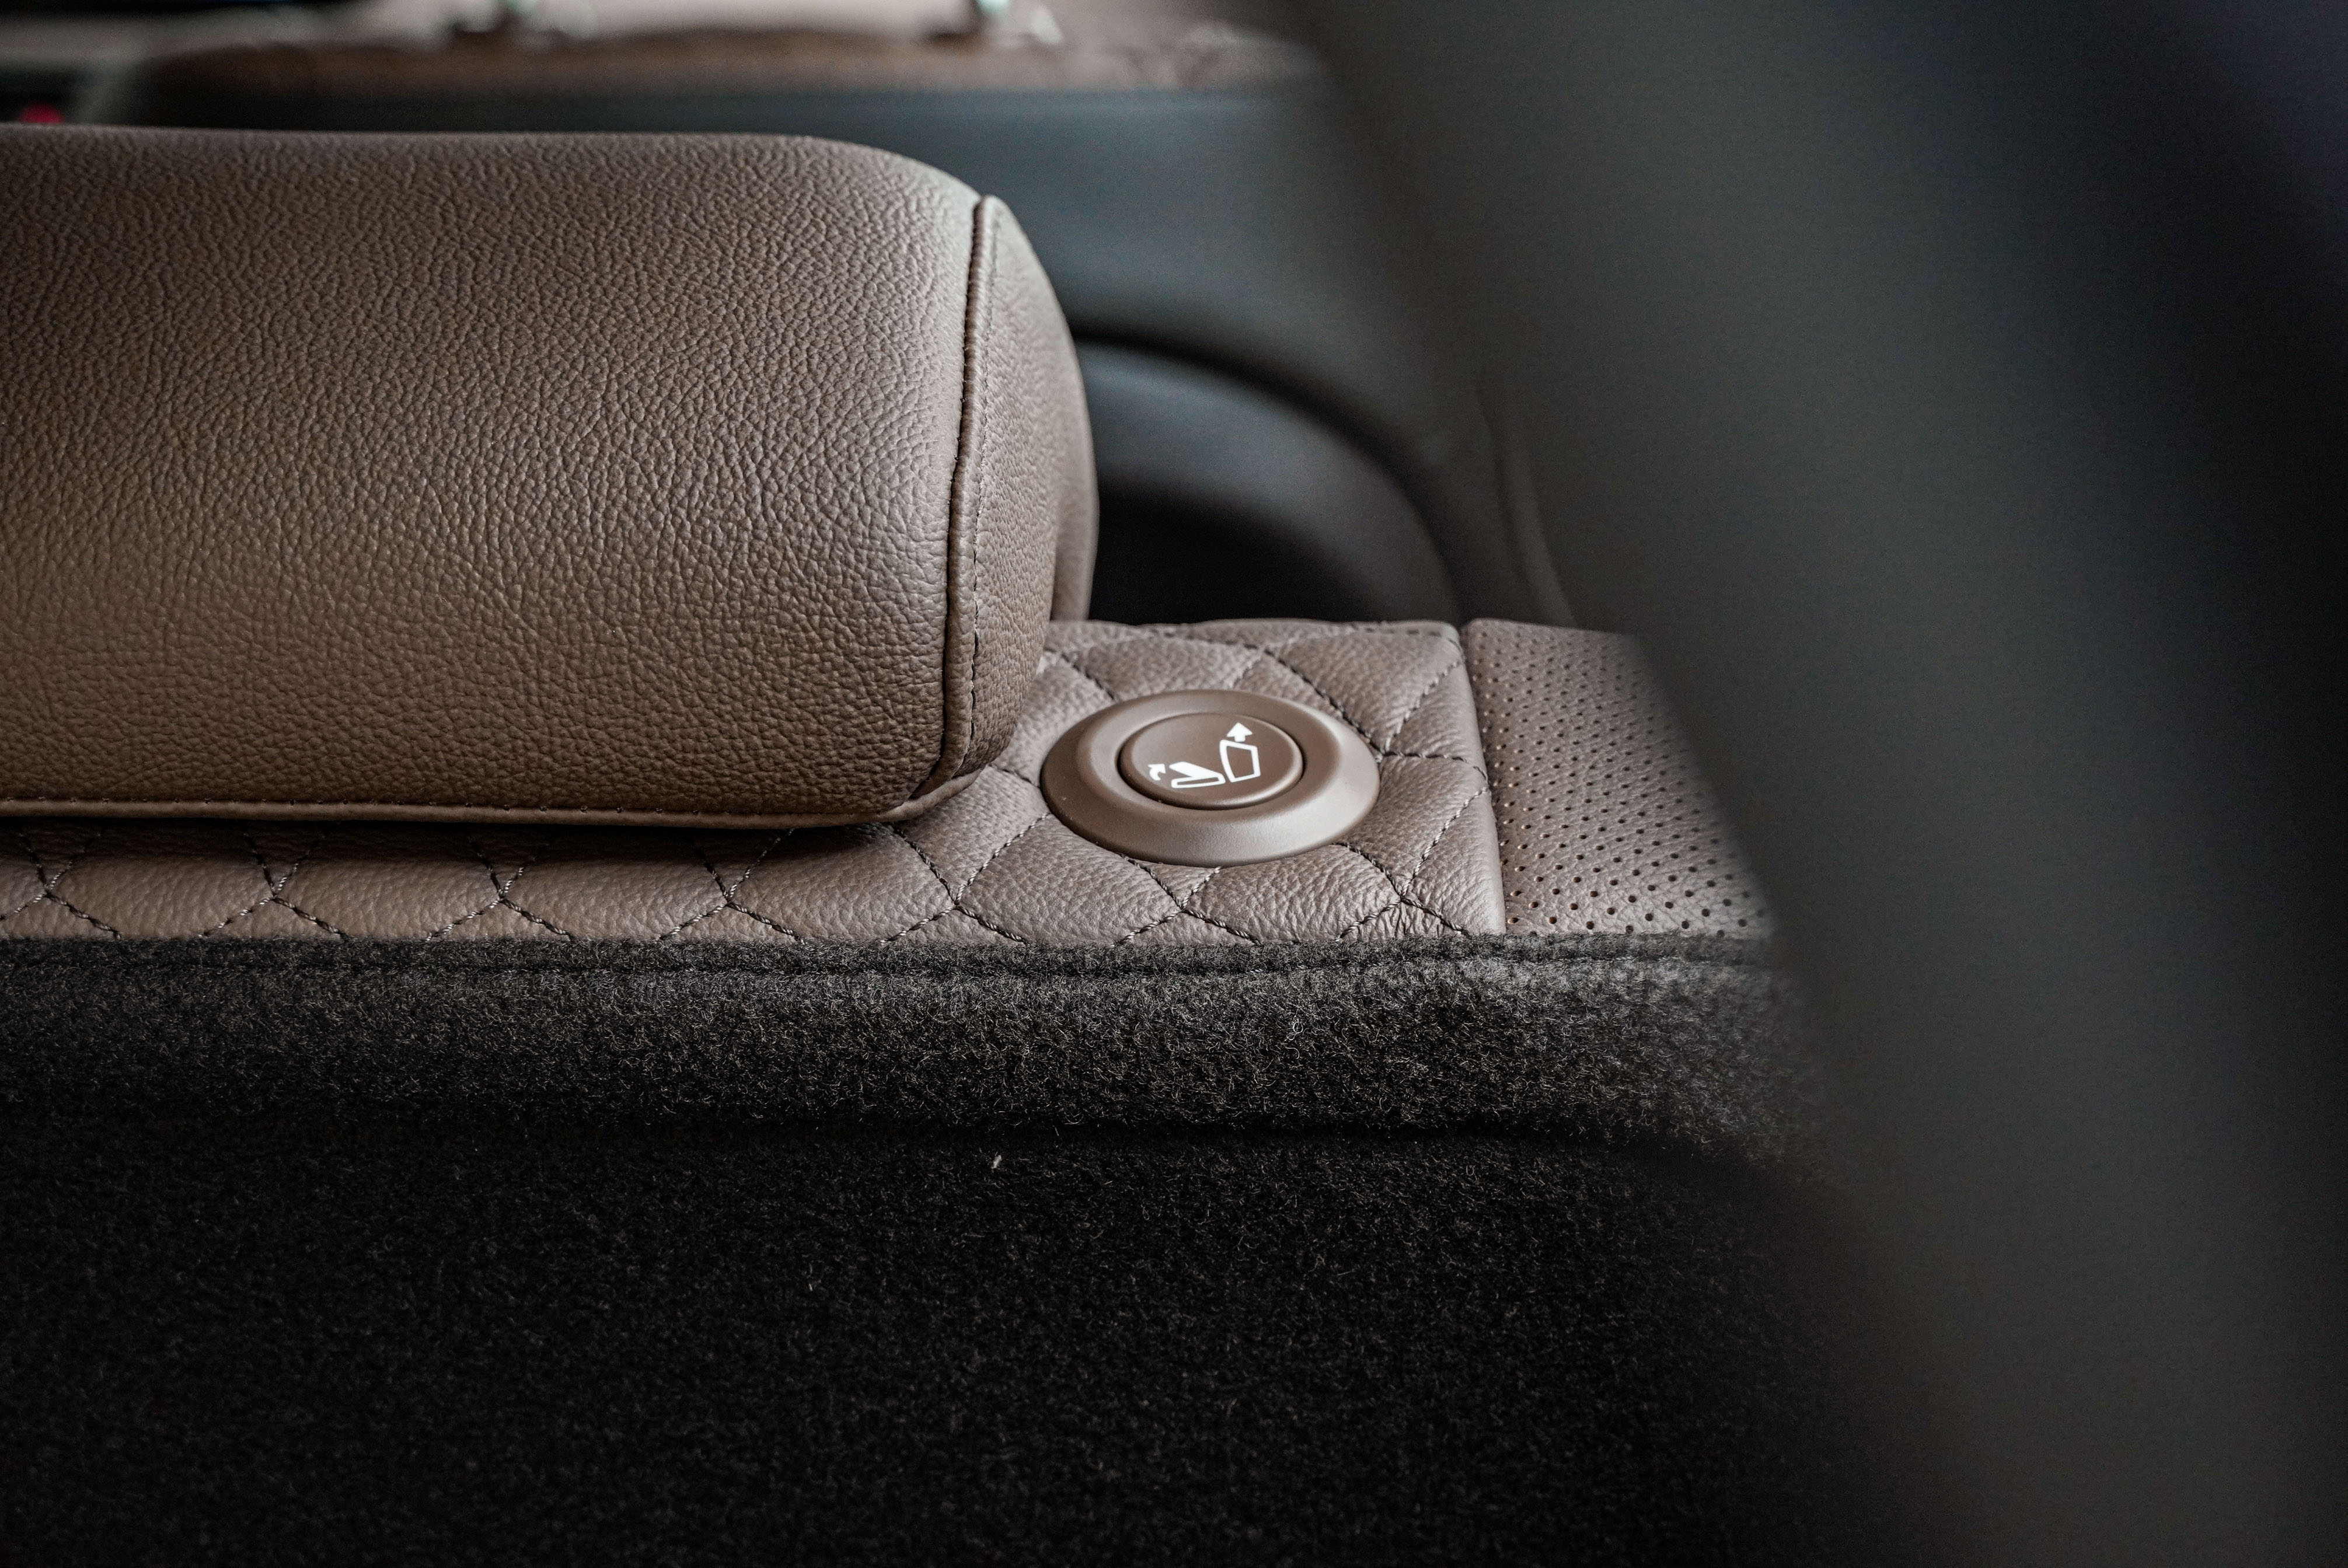 Santa Fe 主打的 Easy System 包含 Easy-Touch 第二排快速傾倒按鈕。